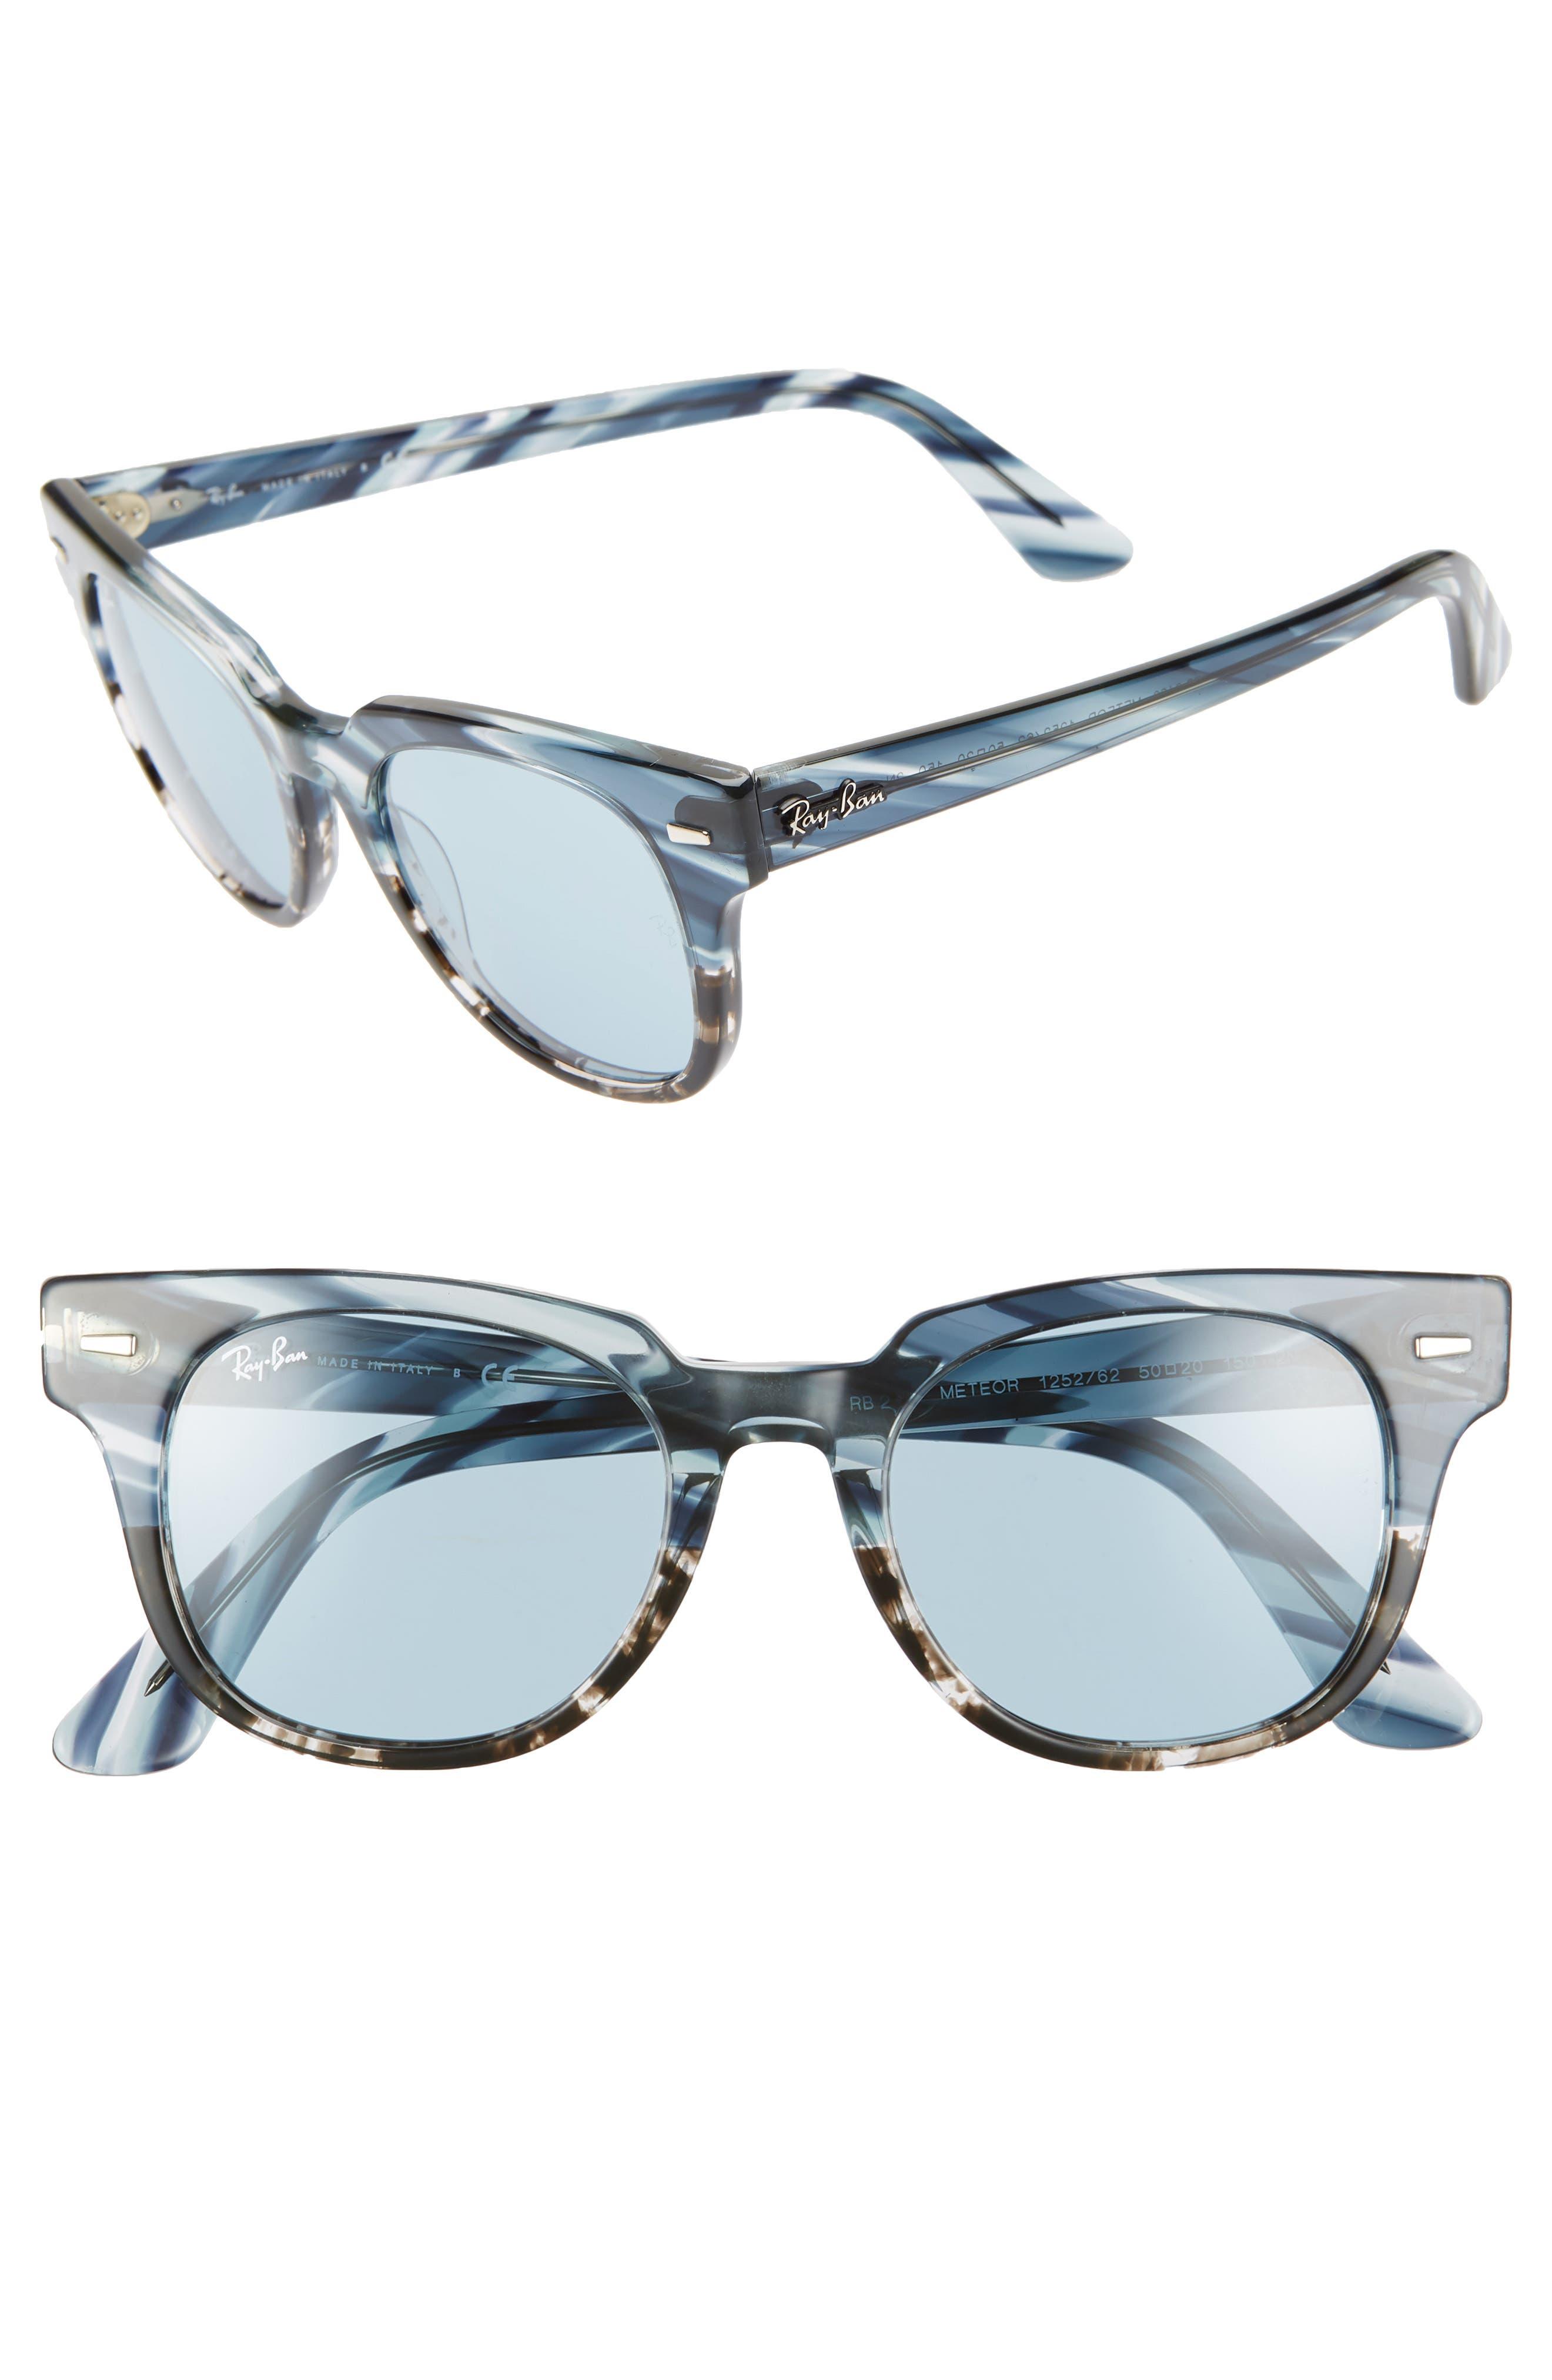 Ray-Ban Wayfarer 50Mm Square Sunglasses - Blue Gradient/ Grey